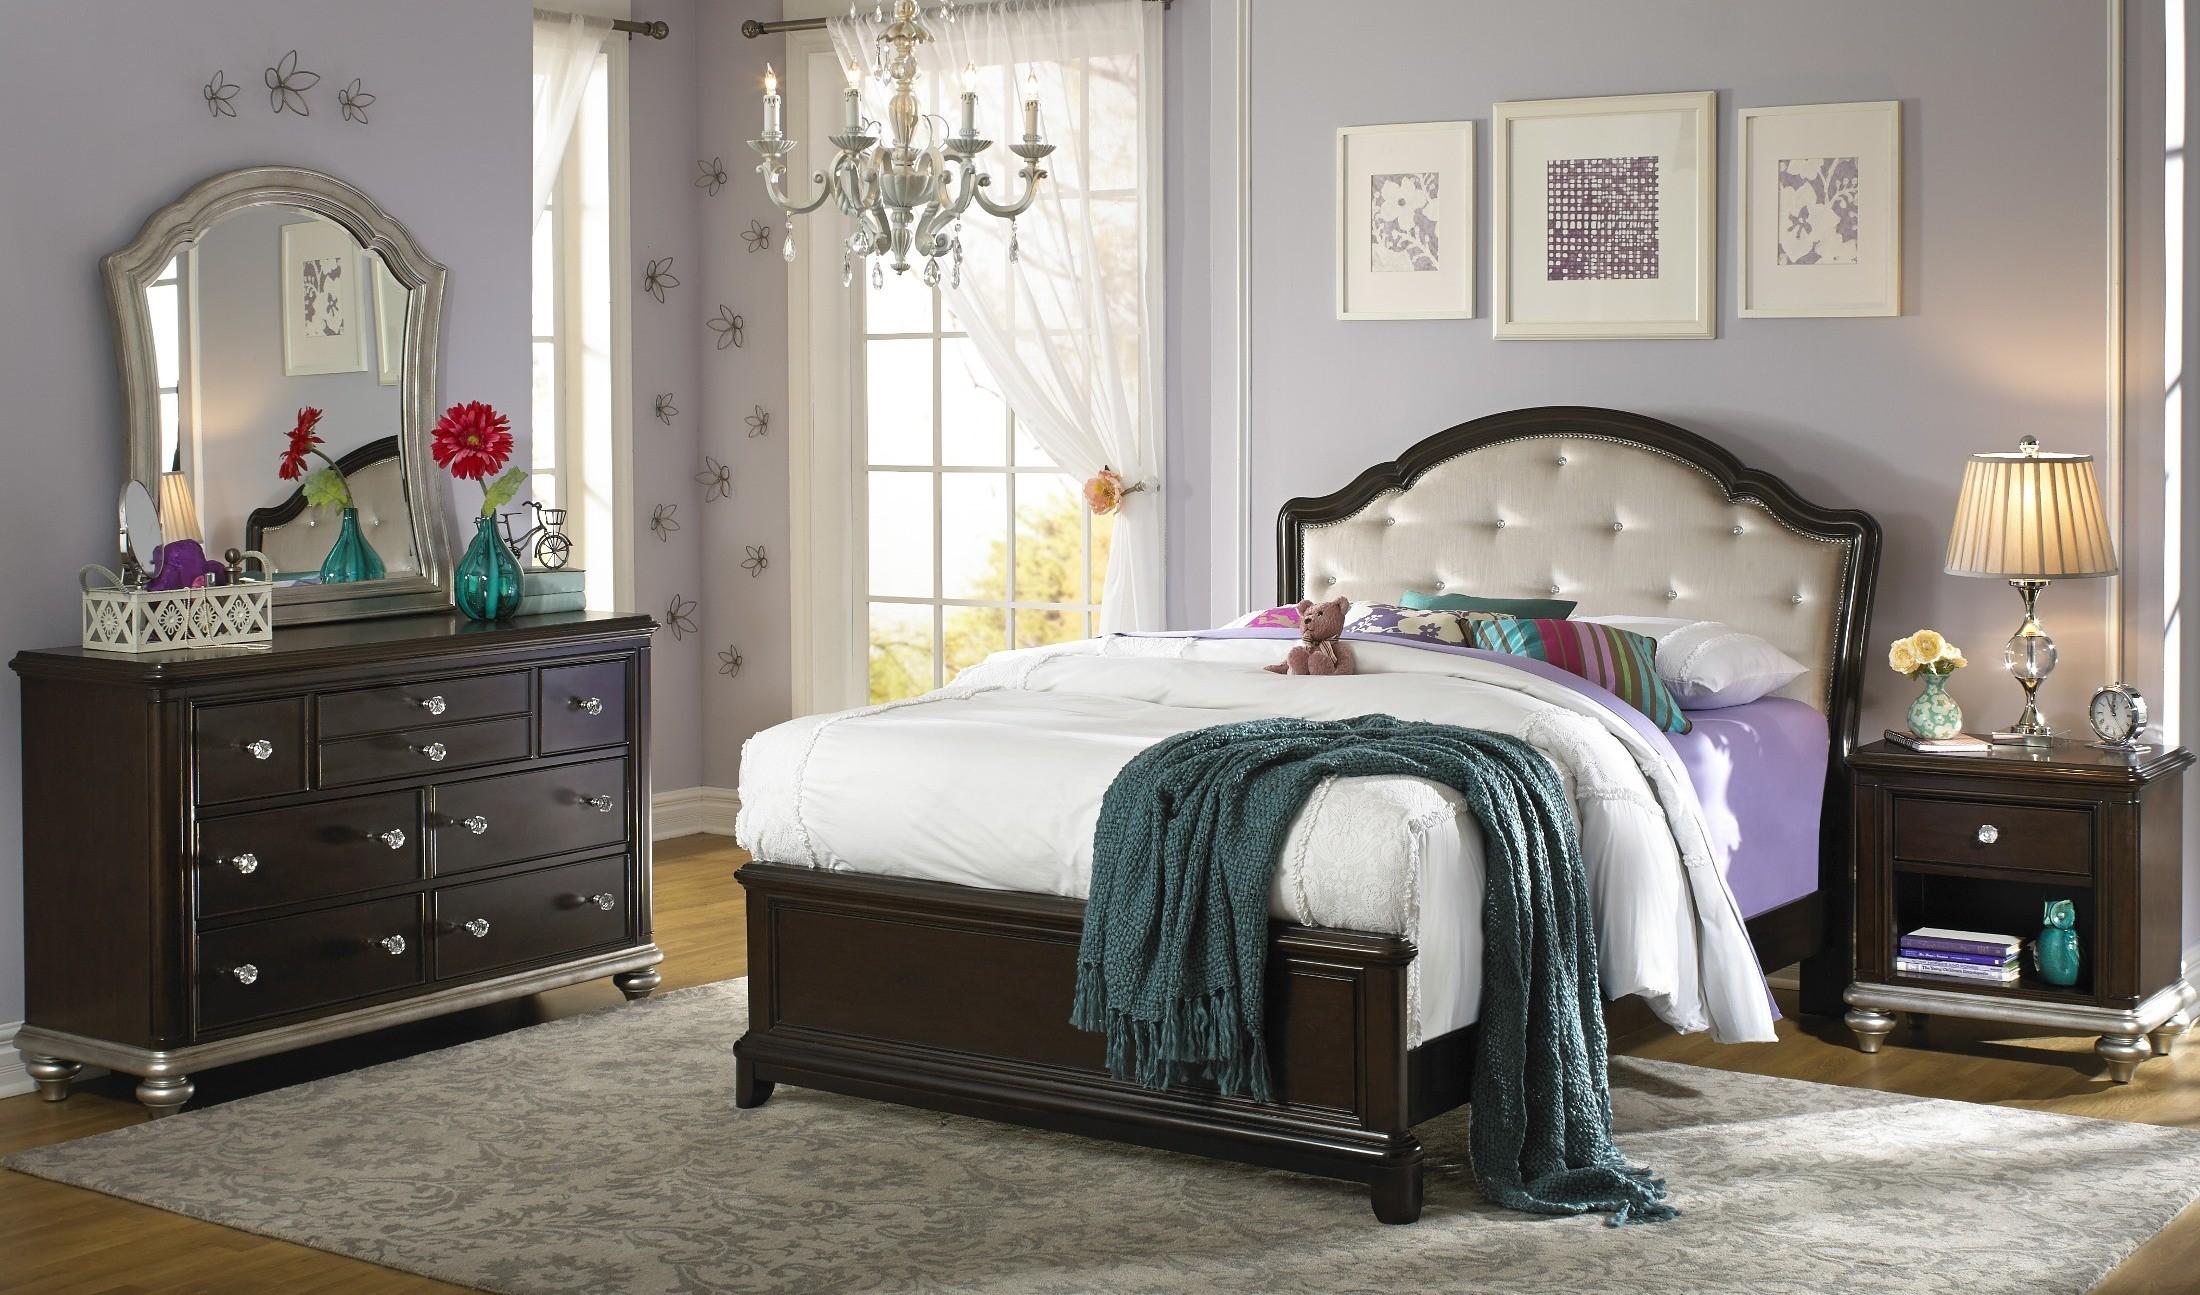 glamour youth black cherry panel bedroom set from samuel lawrence 8688 530 531 401 coleman. Black Bedroom Furniture Sets. Home Design Ideas